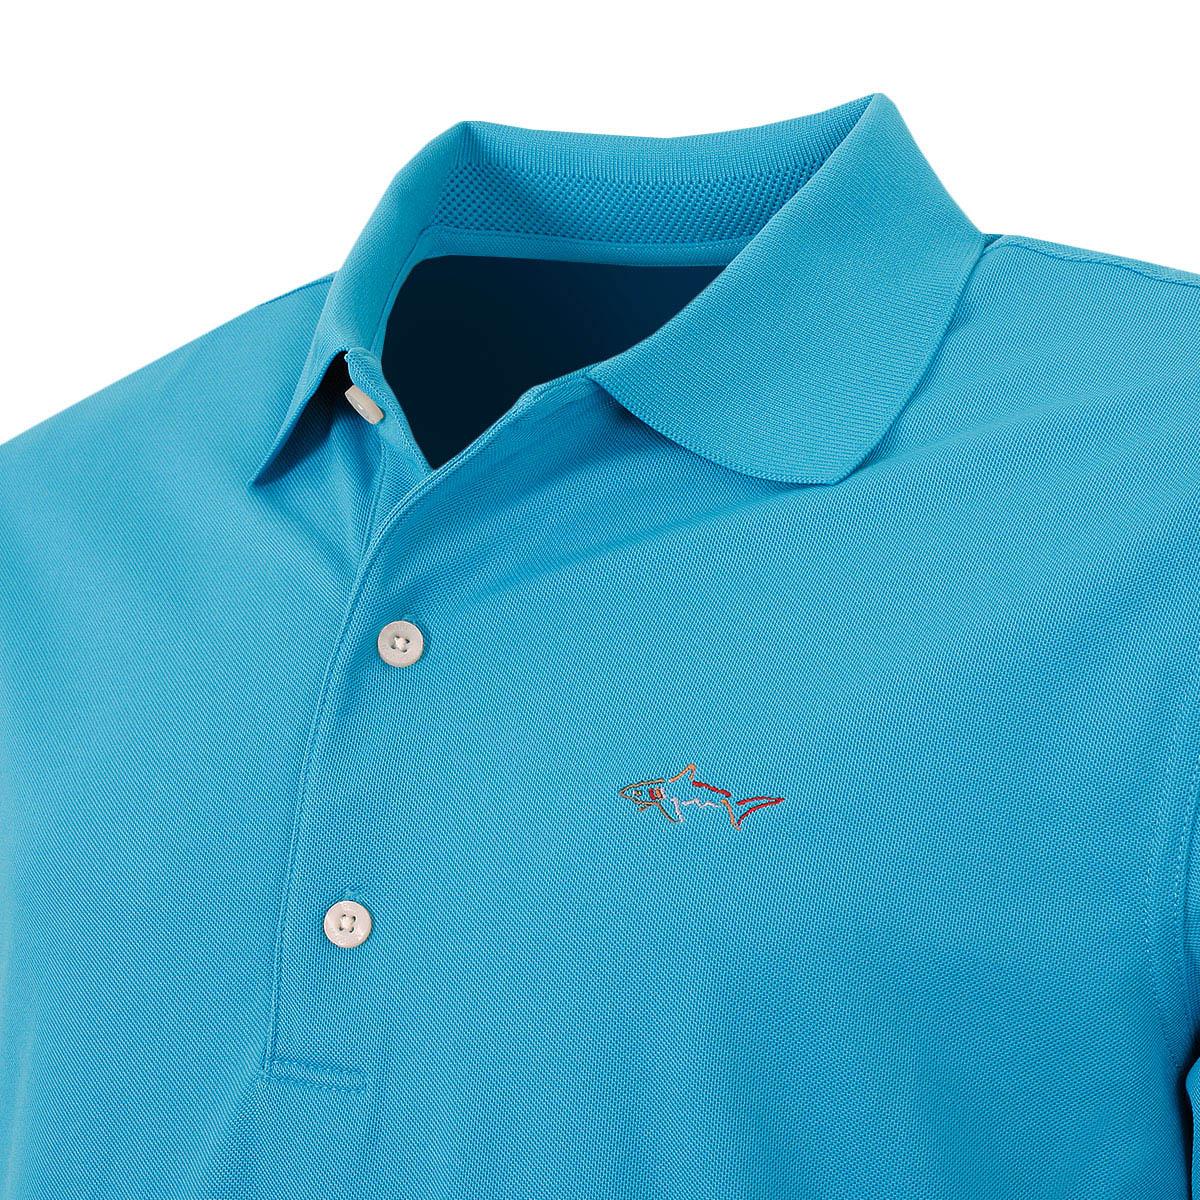 Greg-Norman-Mens-KX04-Performance-Micro-Pique-Golf-Polo-Shirt-28-OFF-RRP thumbnail 6